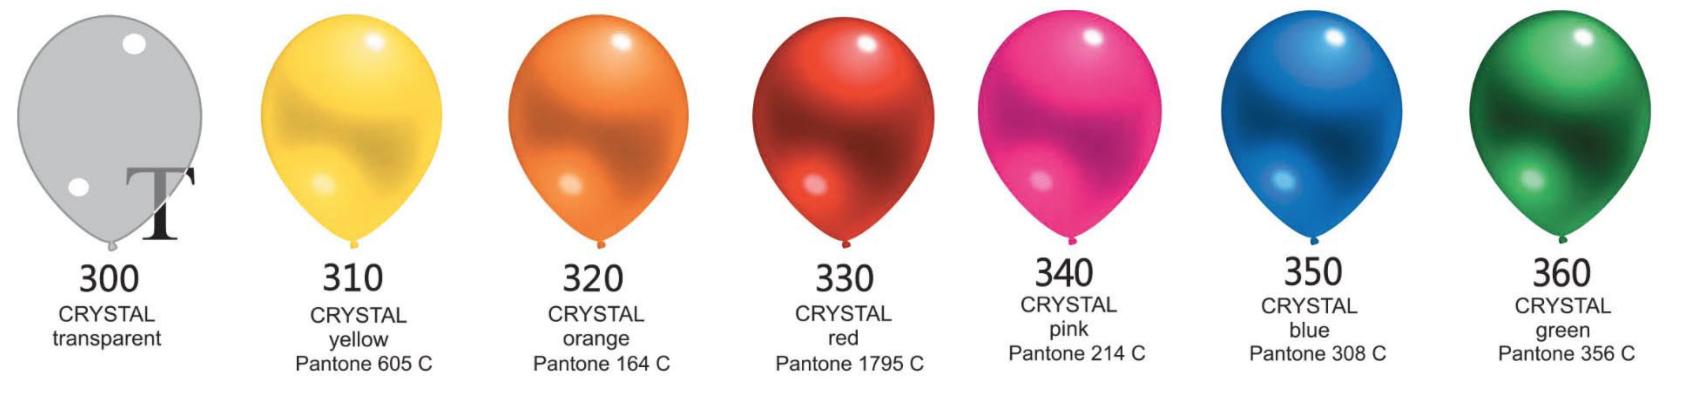 Crystal balloner